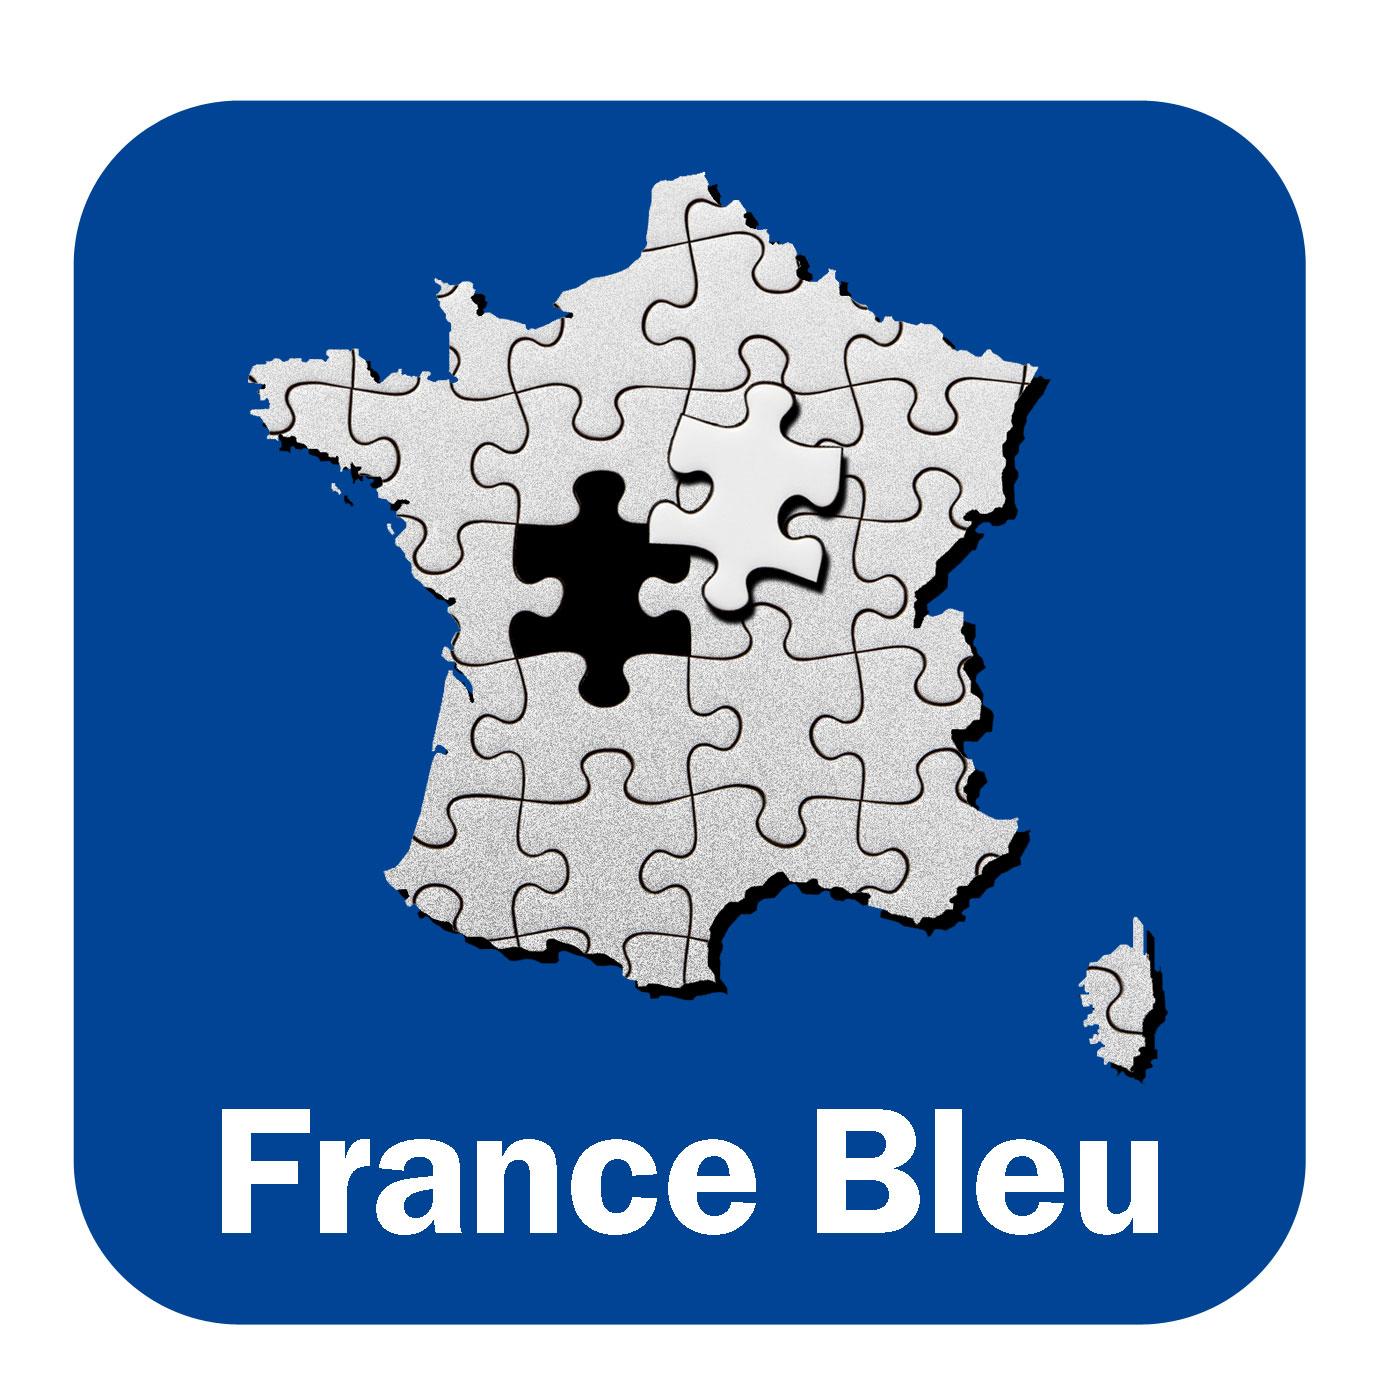 Baradozig France Bleu Breizh Izel